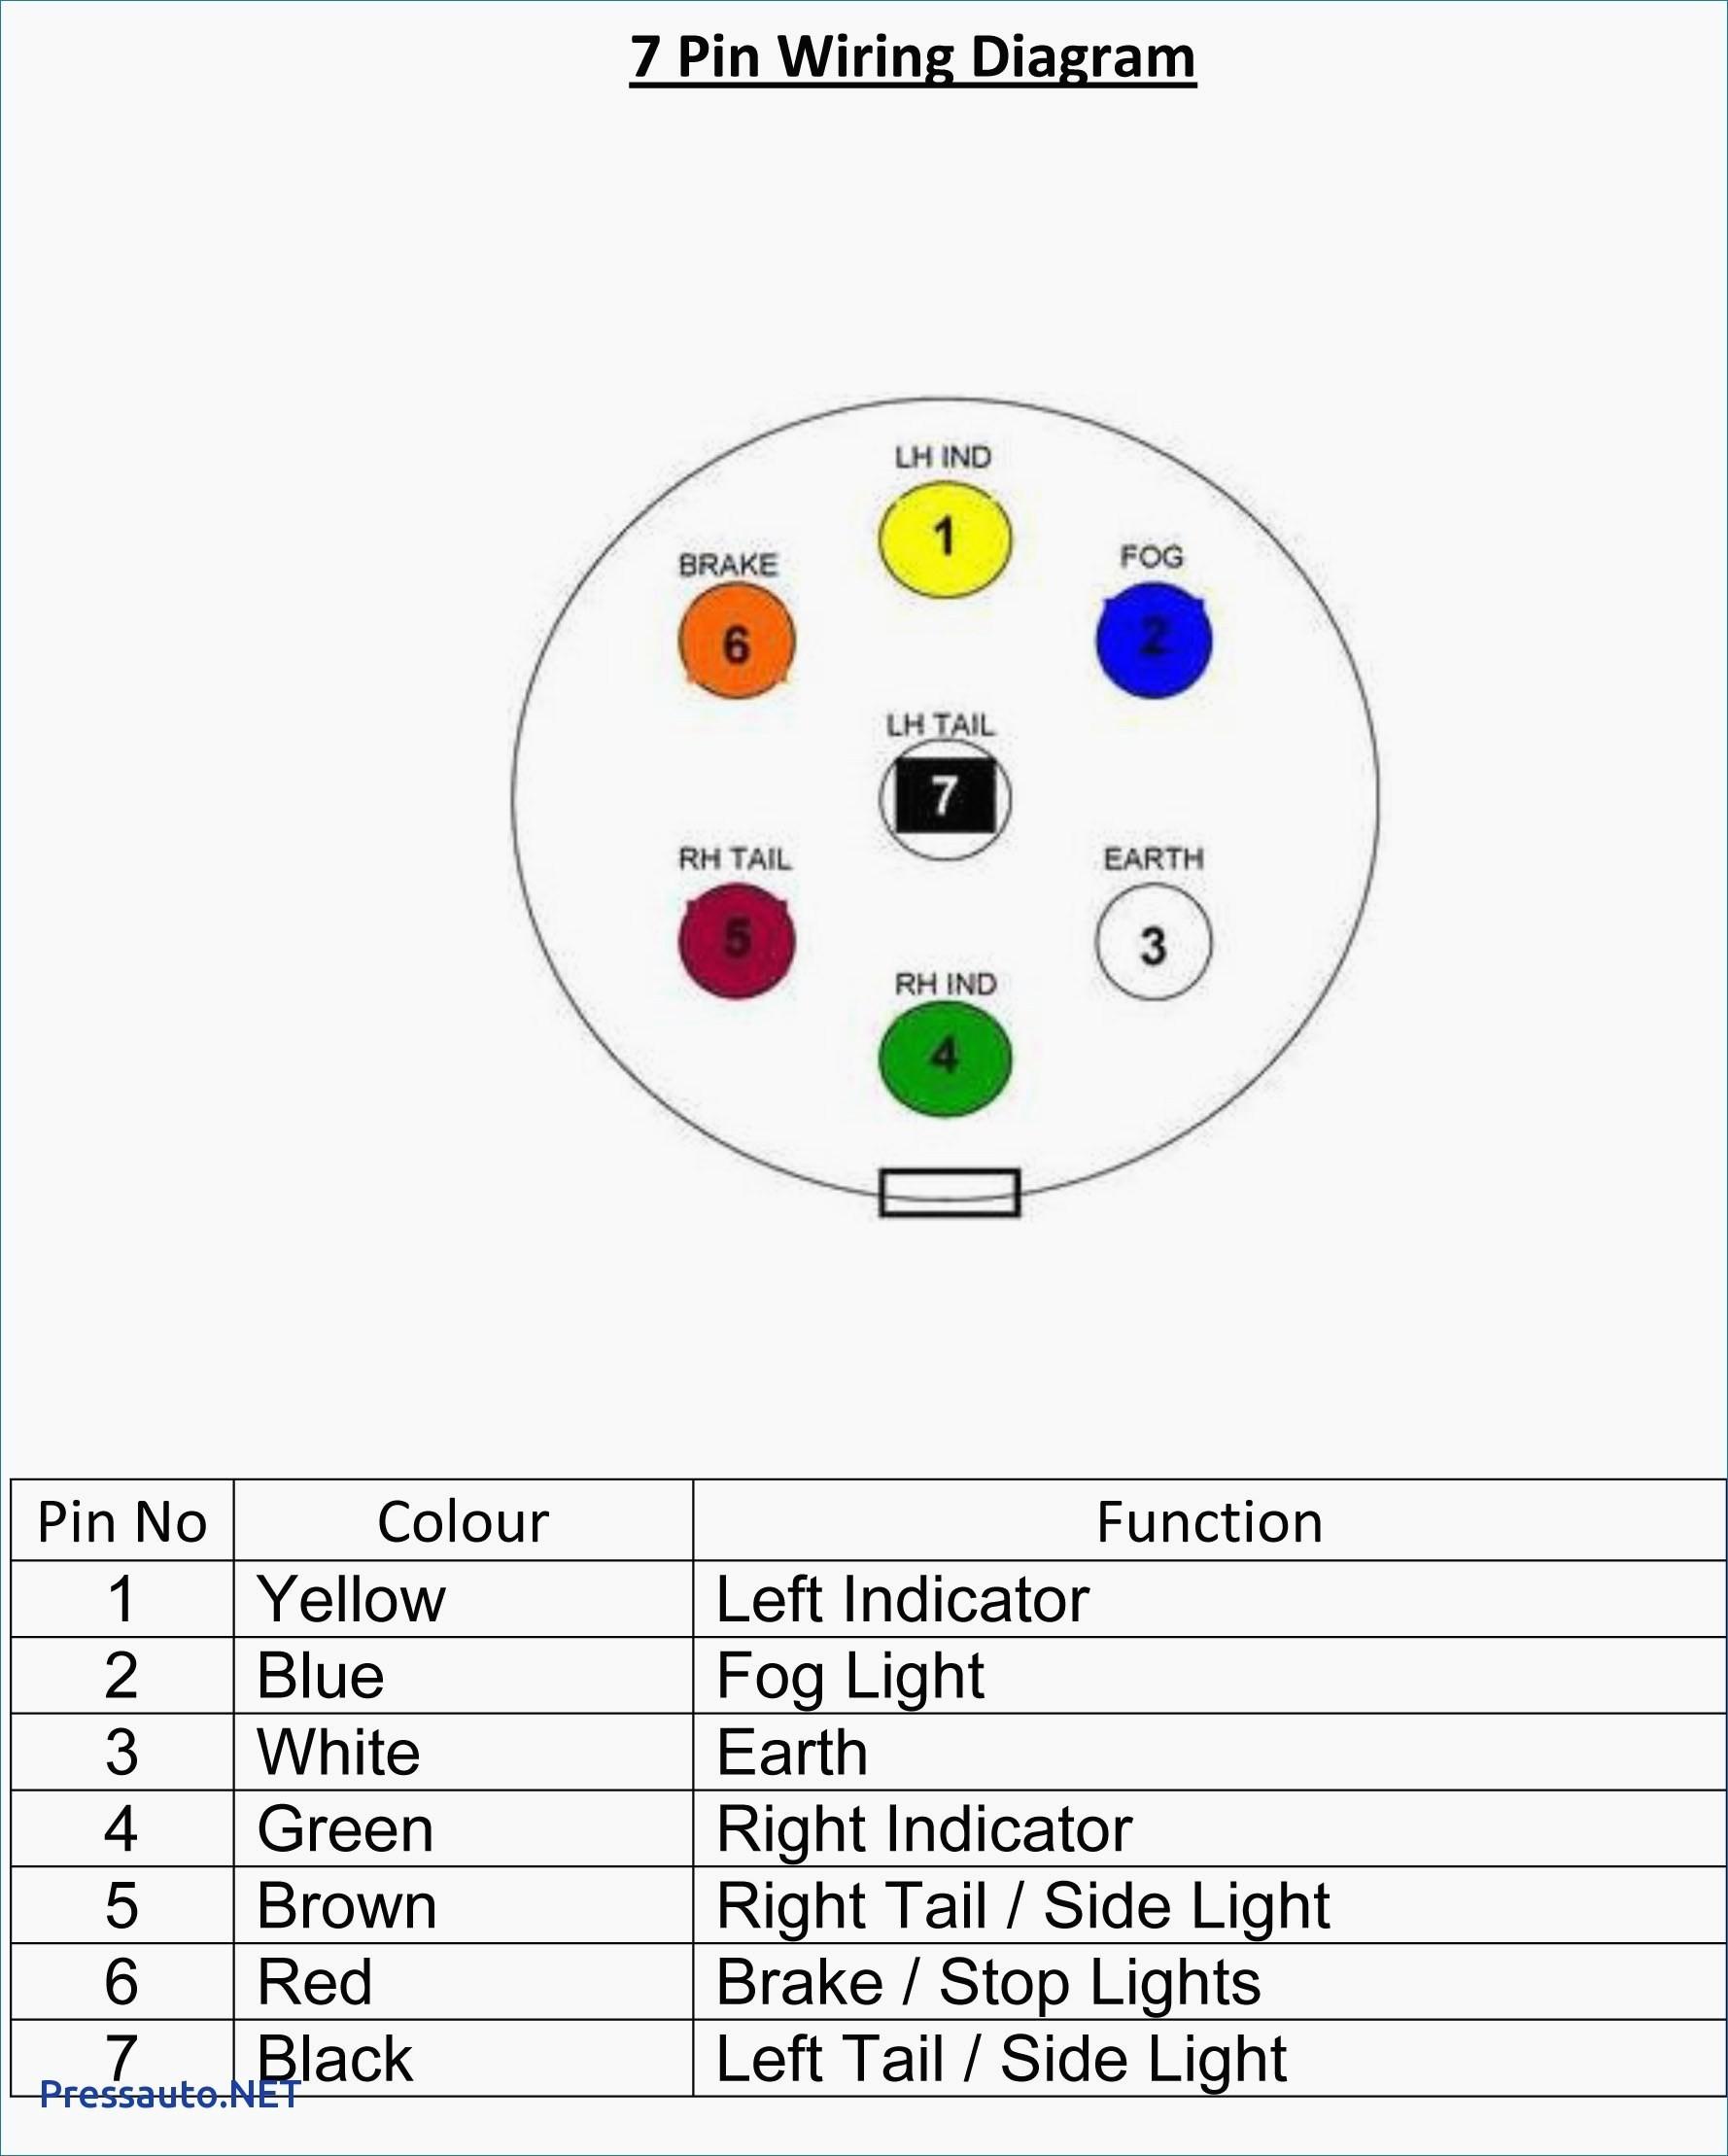 Pollak 7 Way Wiring Diagram | Wiring Library - Pollak Trailer Plug Wiring Diagram